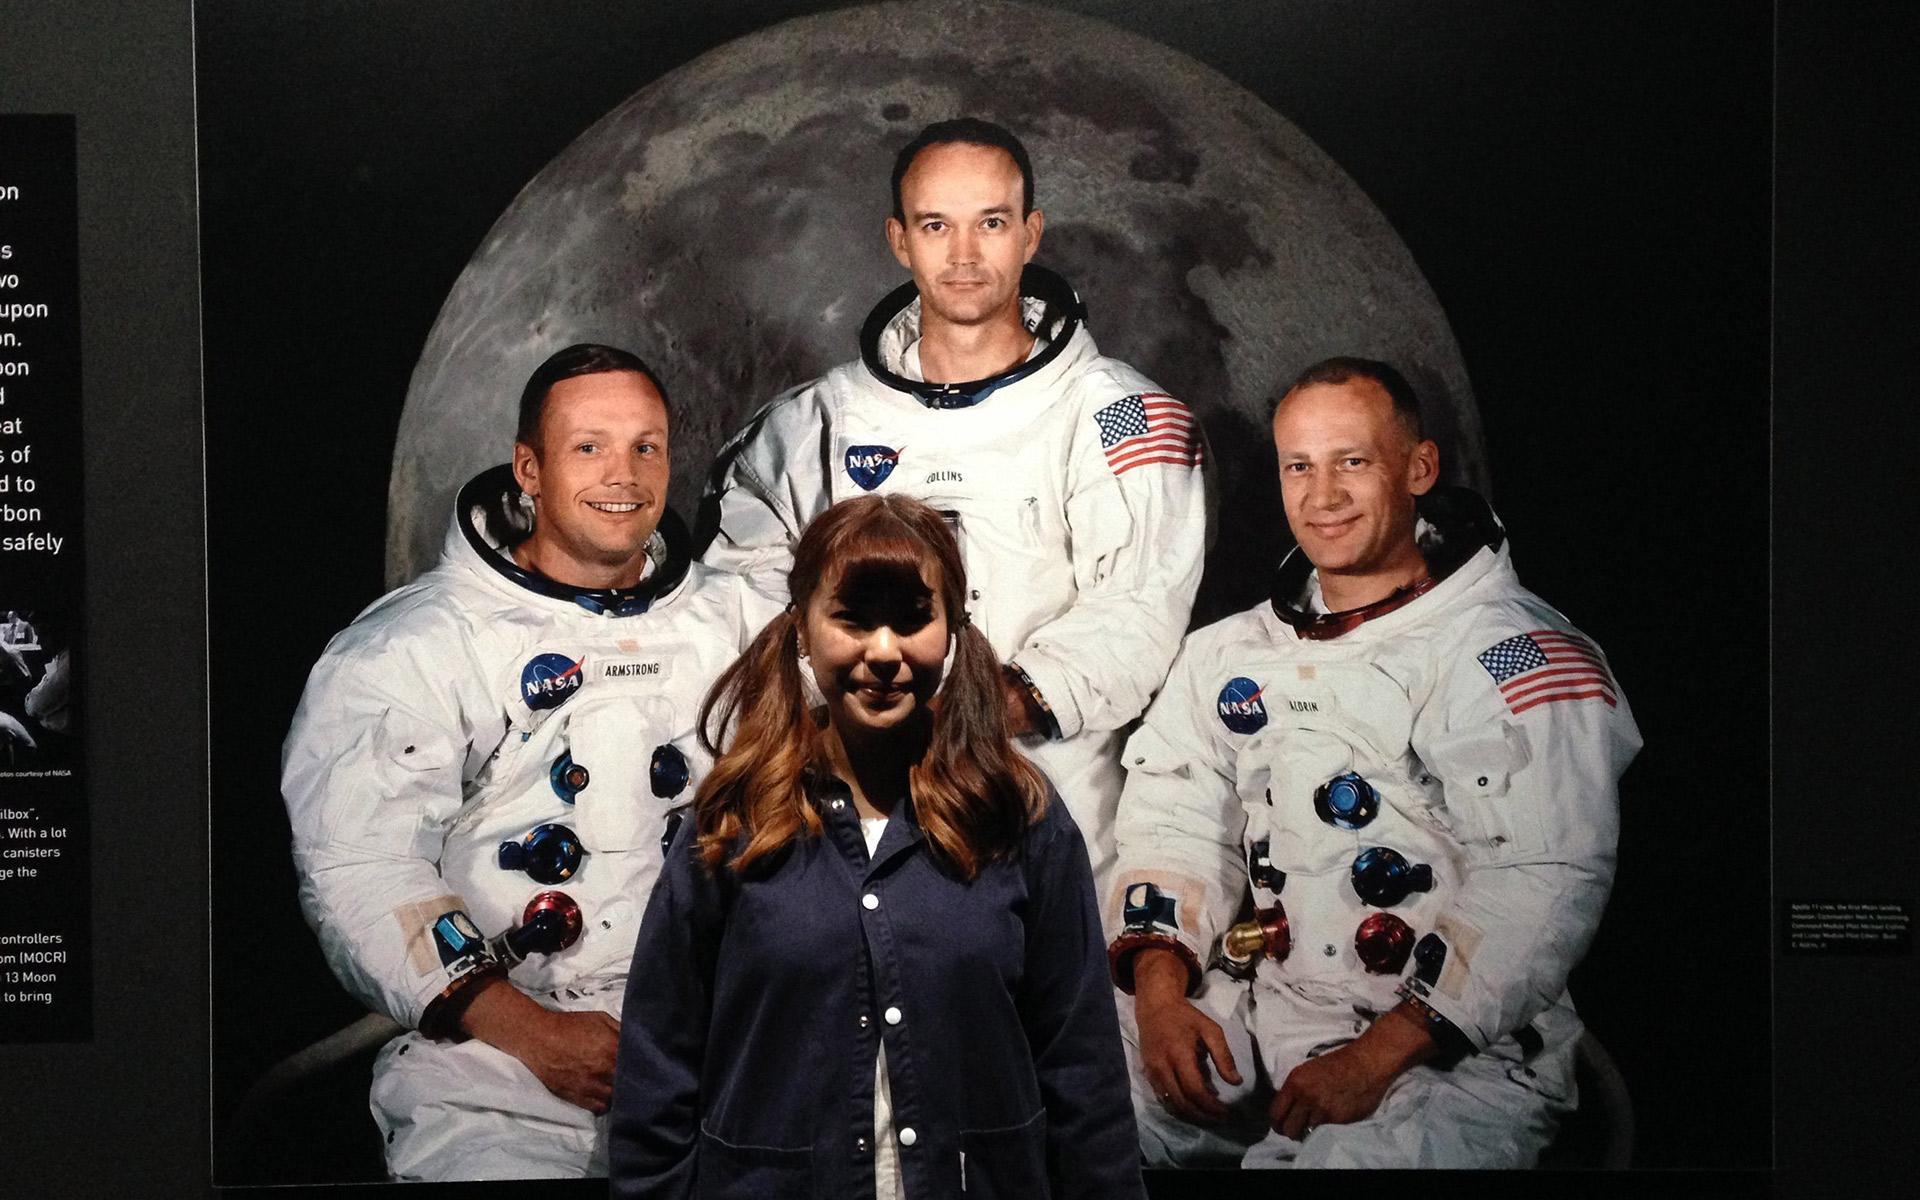 ms-astronaut